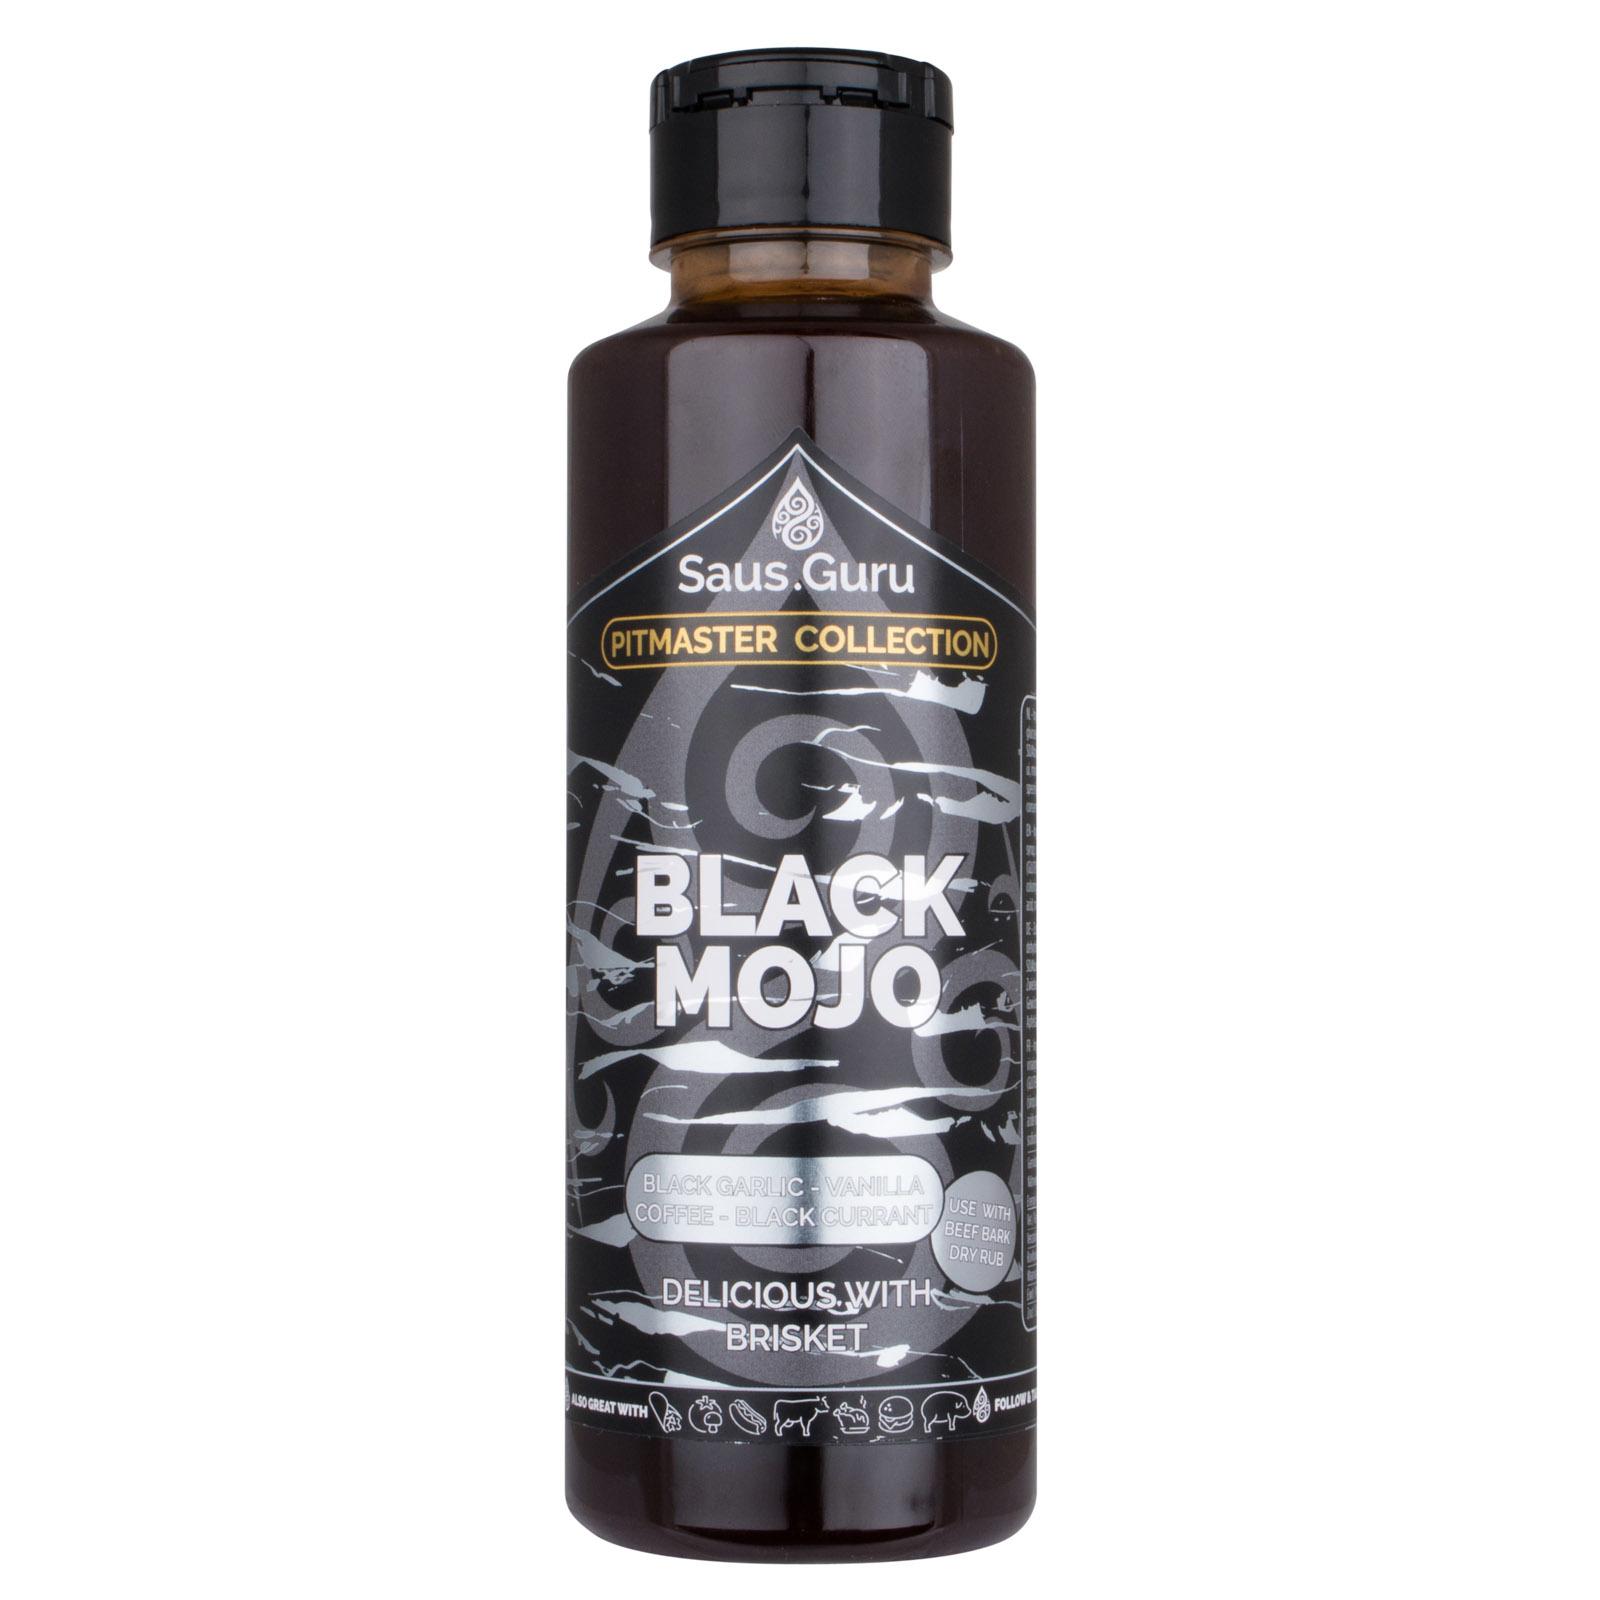 Saus.Guru's Black Mojo-1